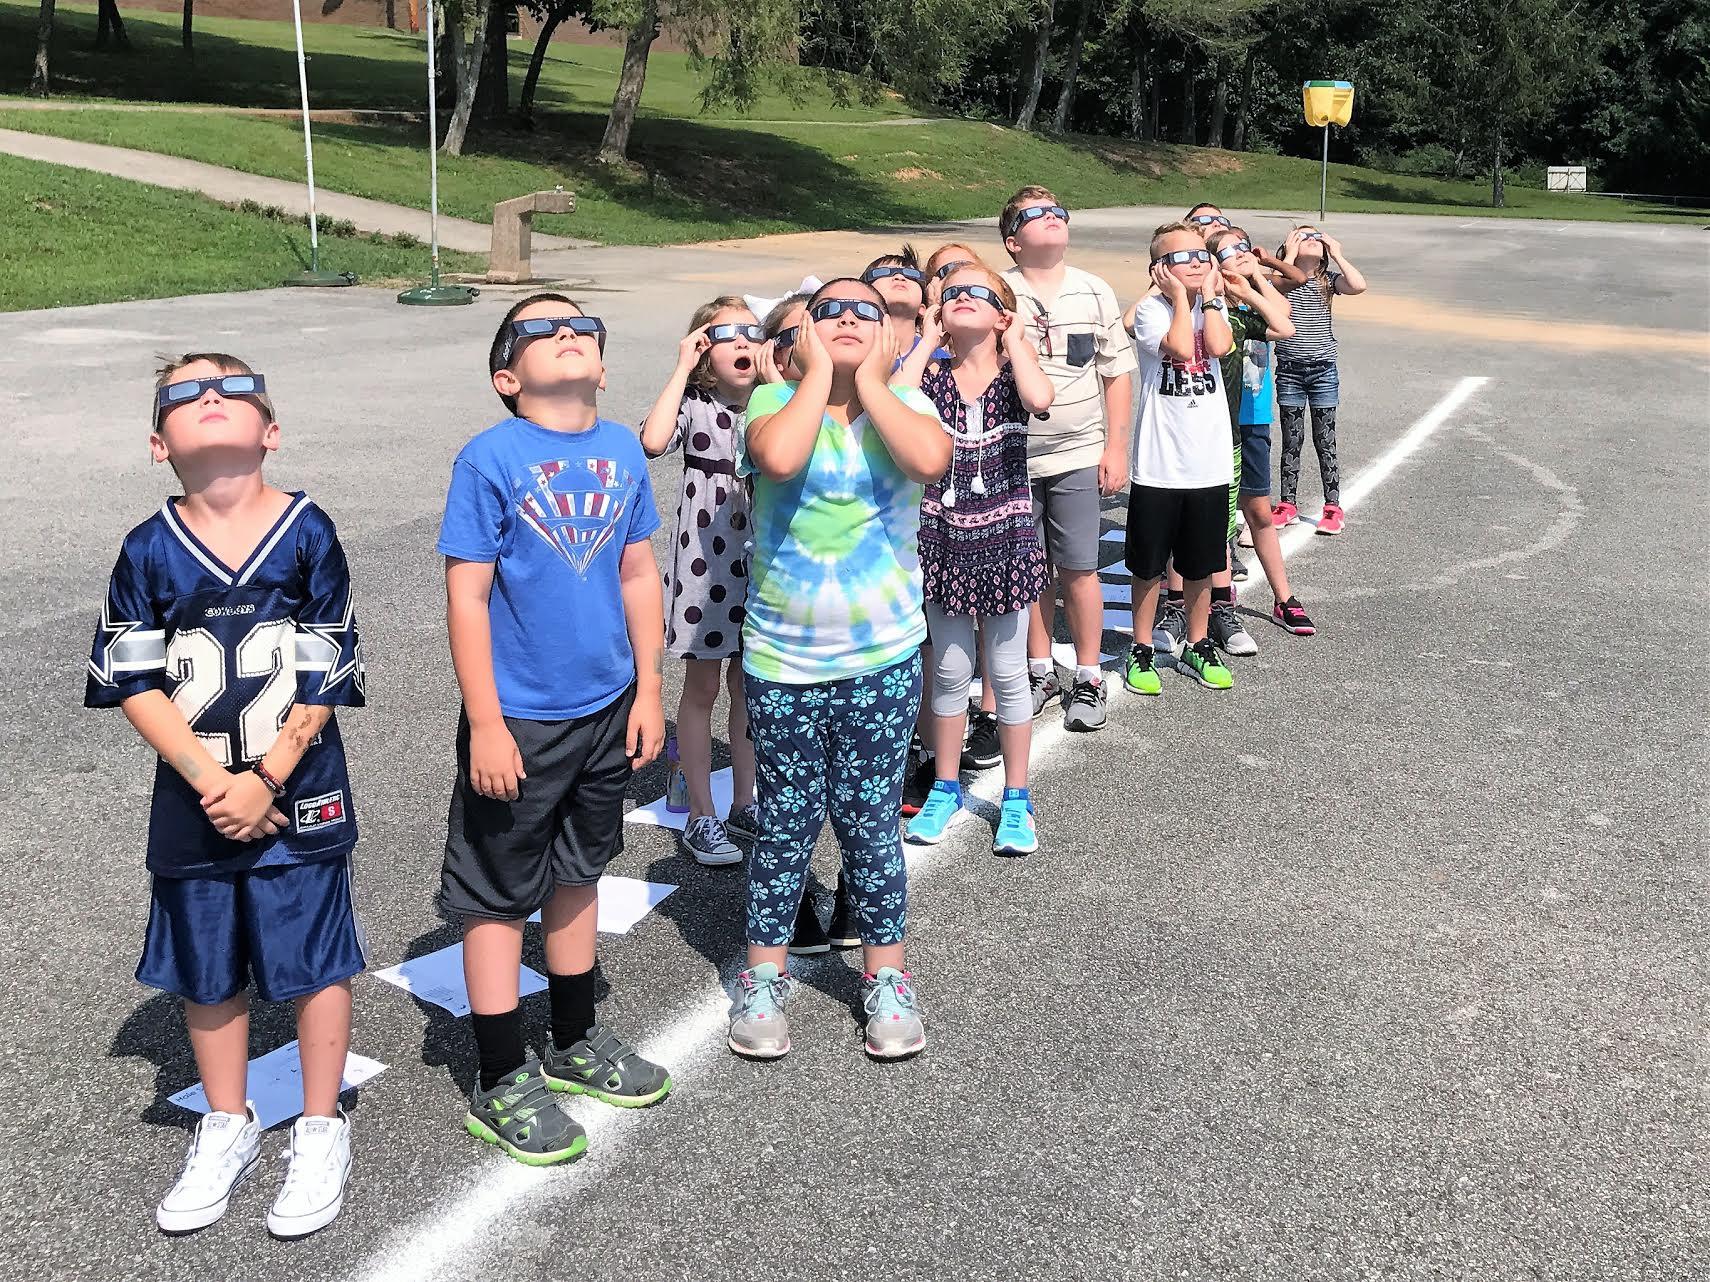 Students at Linden Elementary School in Oak Ridge, Tenn., try eclipse glasses. (Chalkbeat file)